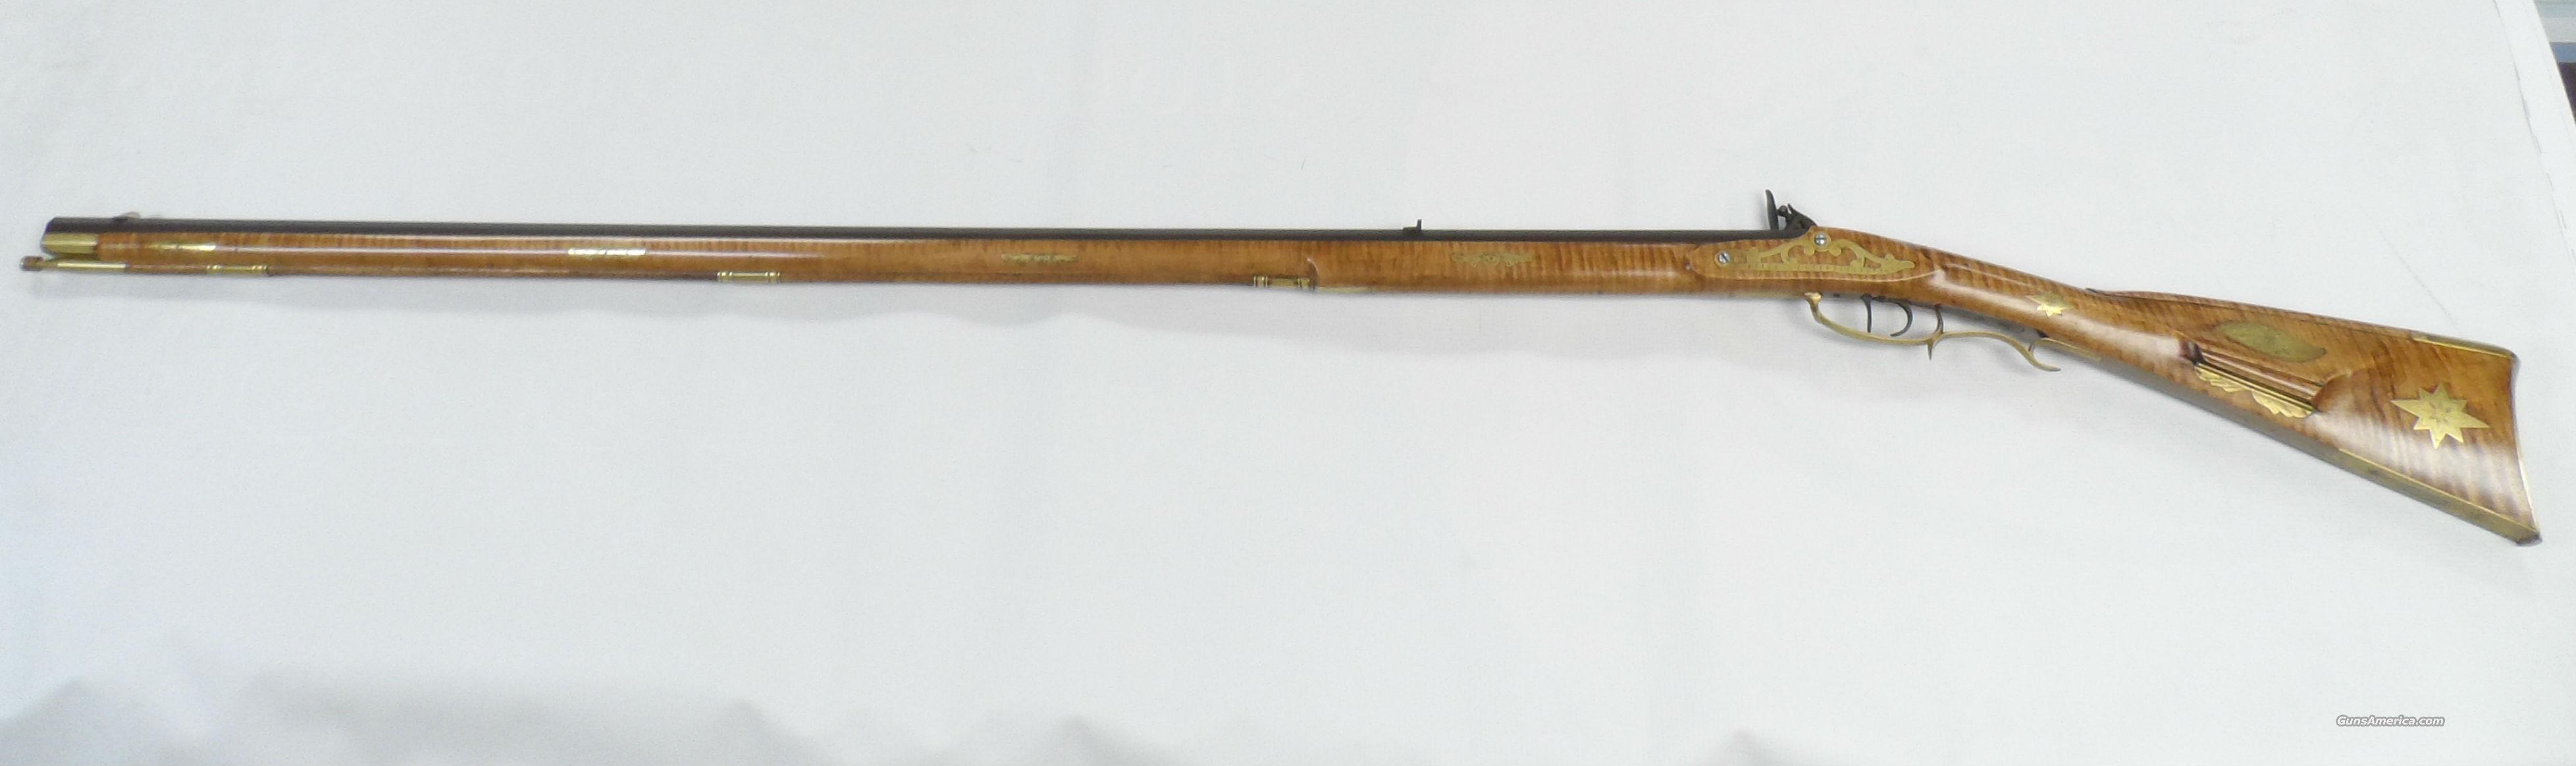 Louis smith black powder kentucky rifle 45 cal guns gt rifles